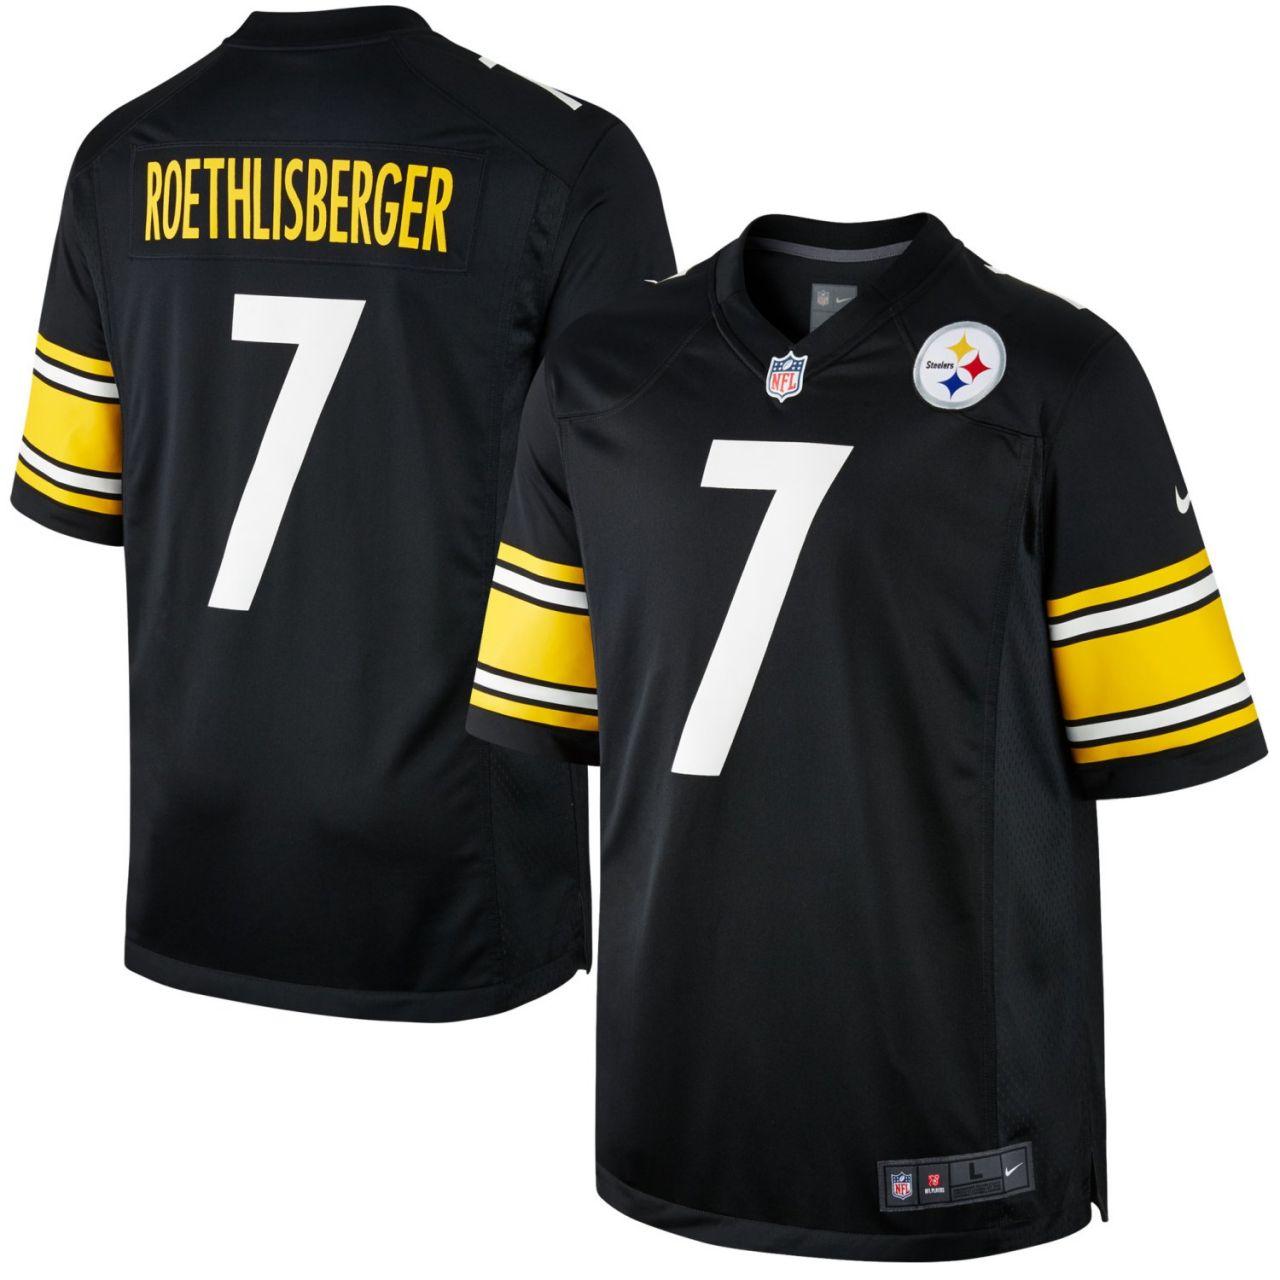 amfoo - Nike GAME Jersey Pittsburgh Steelers #7 Ben Roethlisberger